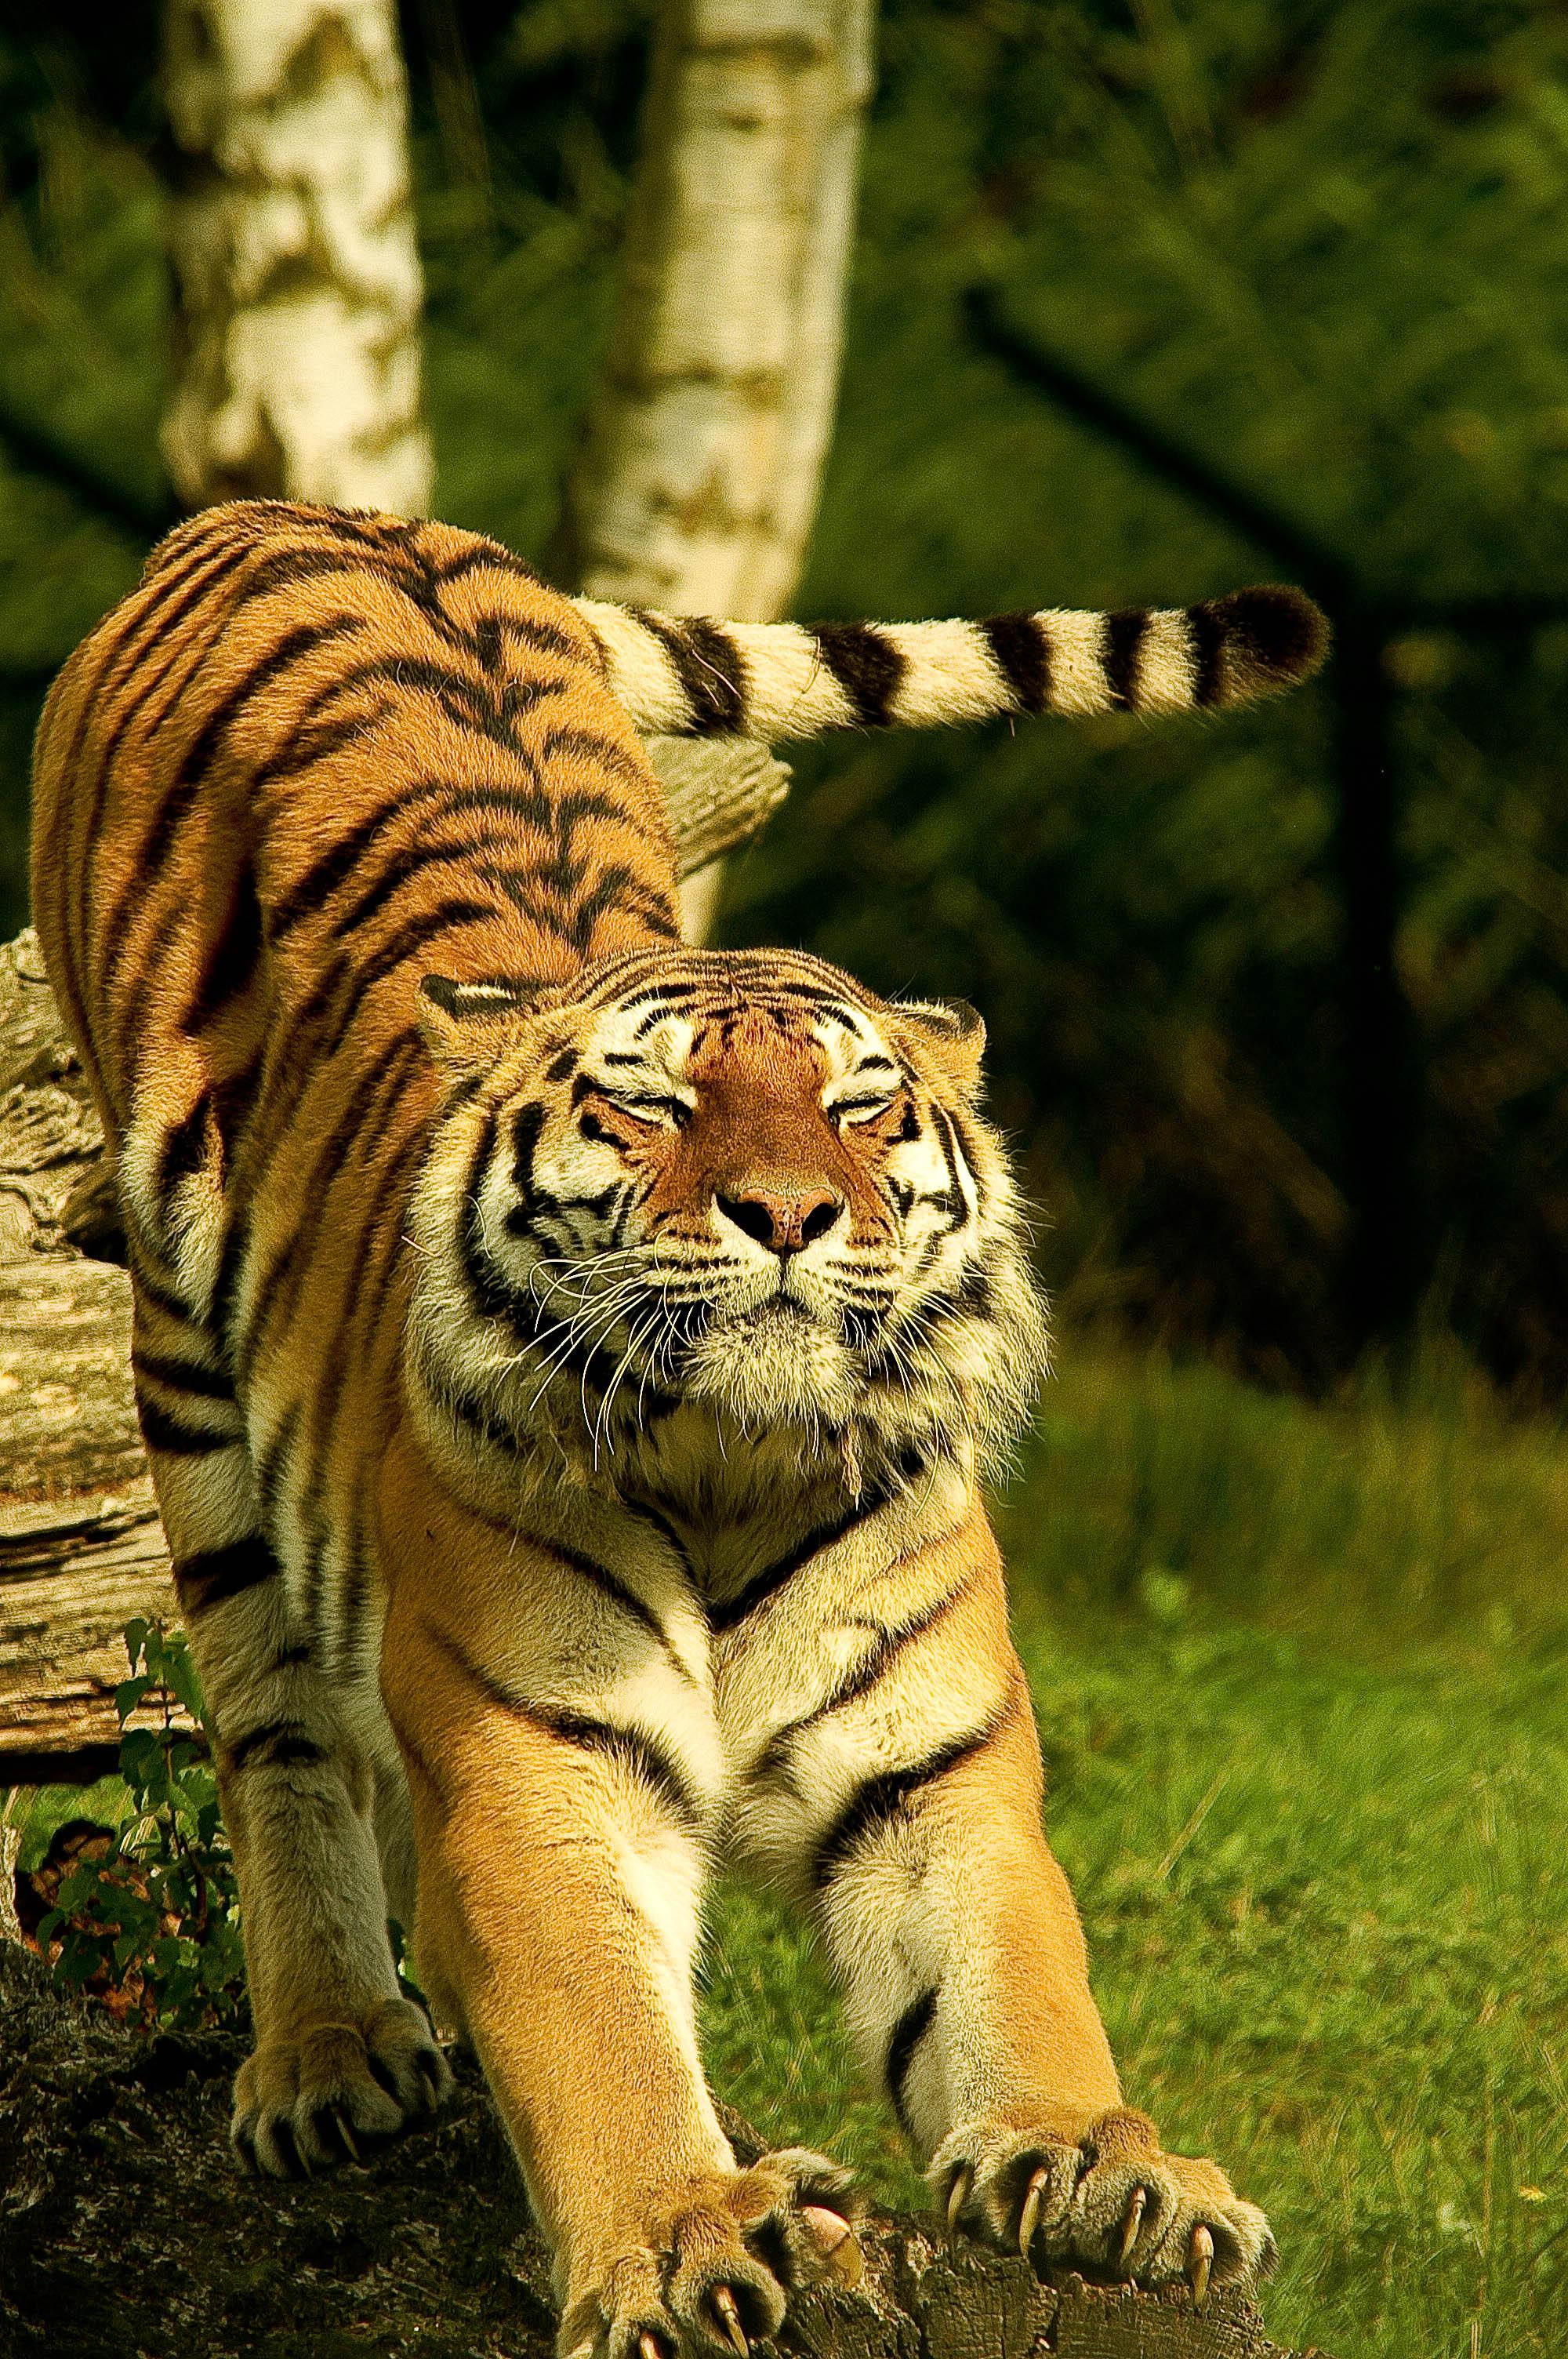 Black Dog Wallpaper Bengal Tiger On Green Grass 183 Free Stock Photo